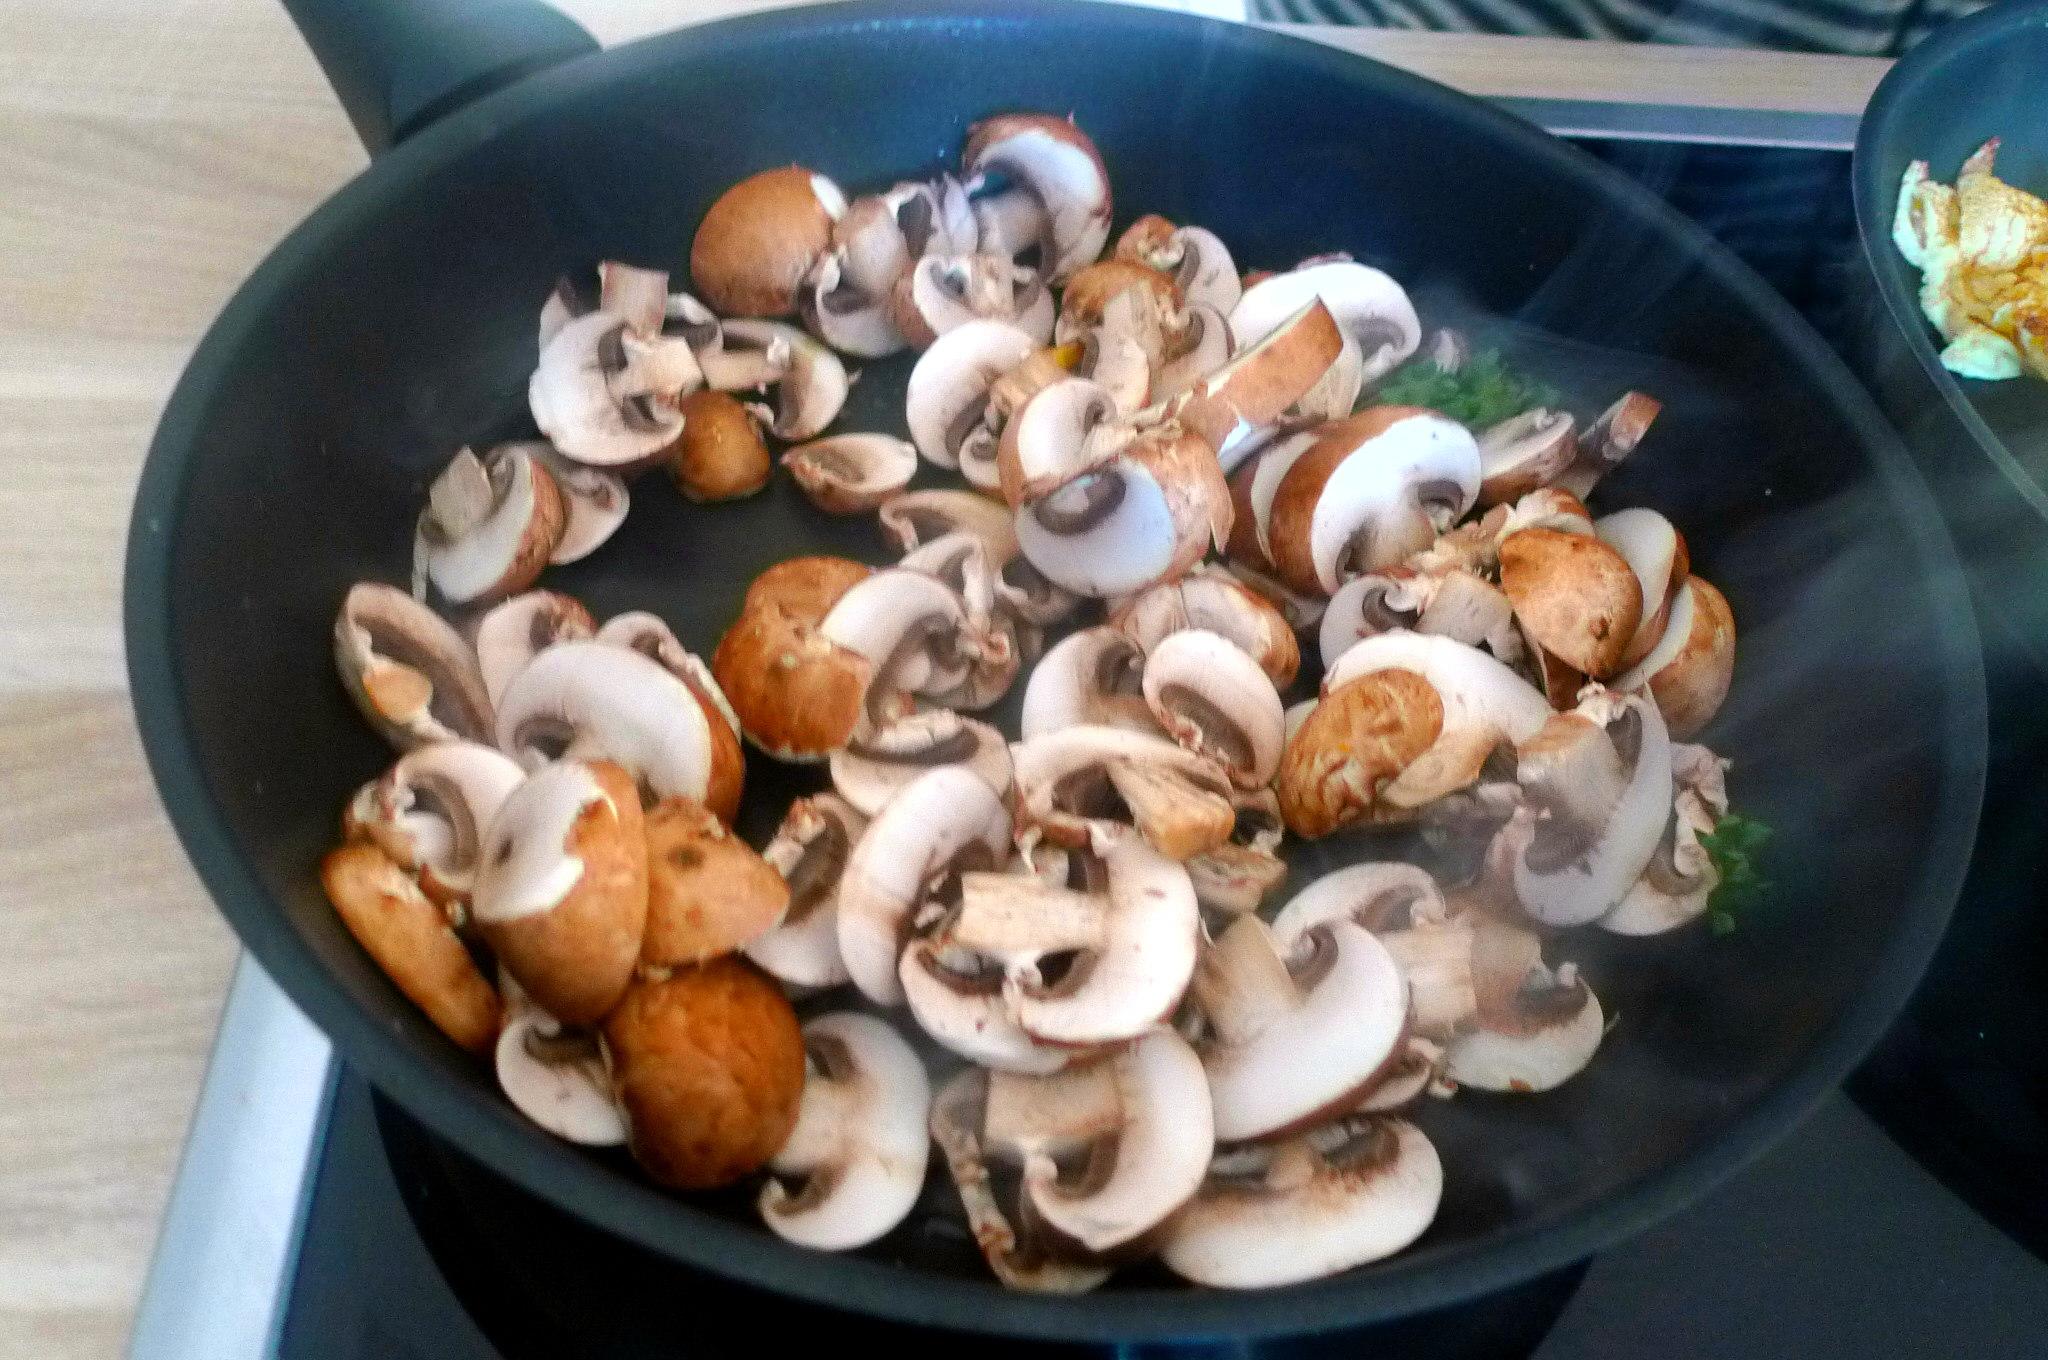 gefullte-pfannkuchenpilzeguacamoleapfel-im-schlafrock-6